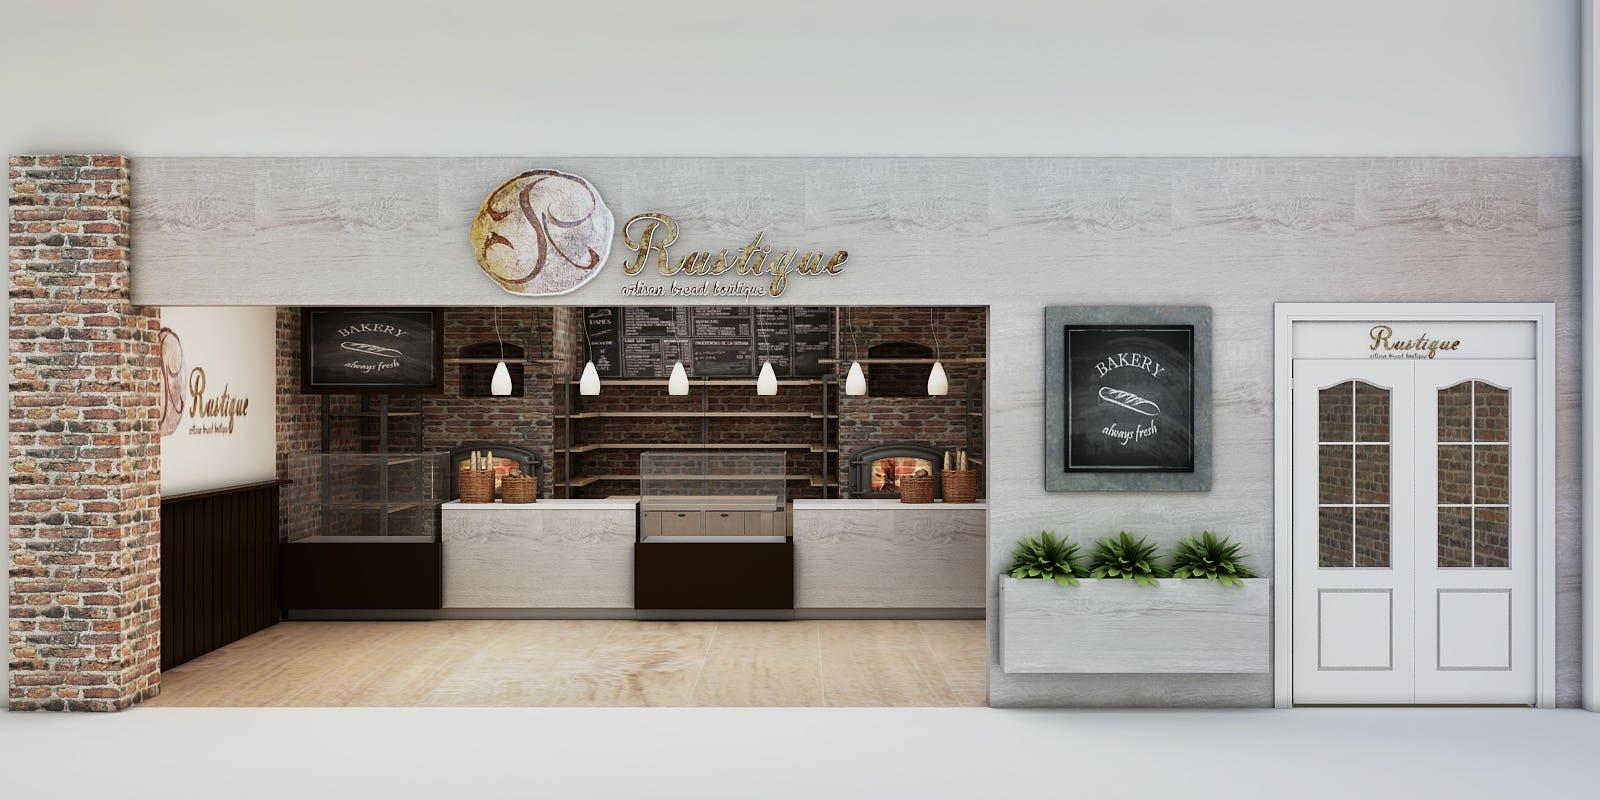 Artisan Bread Store Design